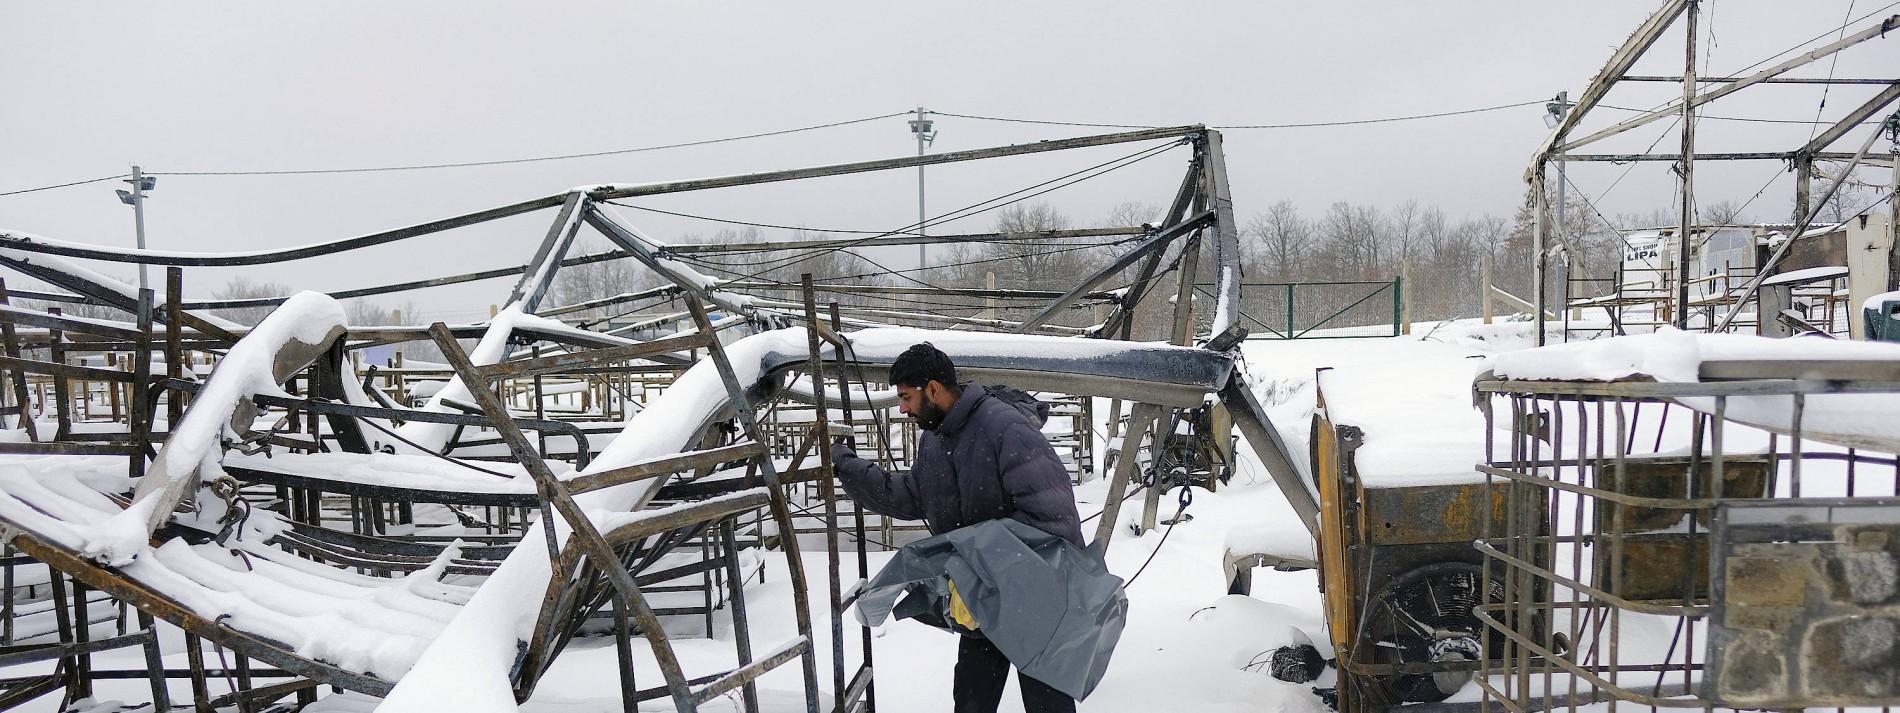 Hunderte Migranten kampieren bei Schneefall in Bosnien im Freien